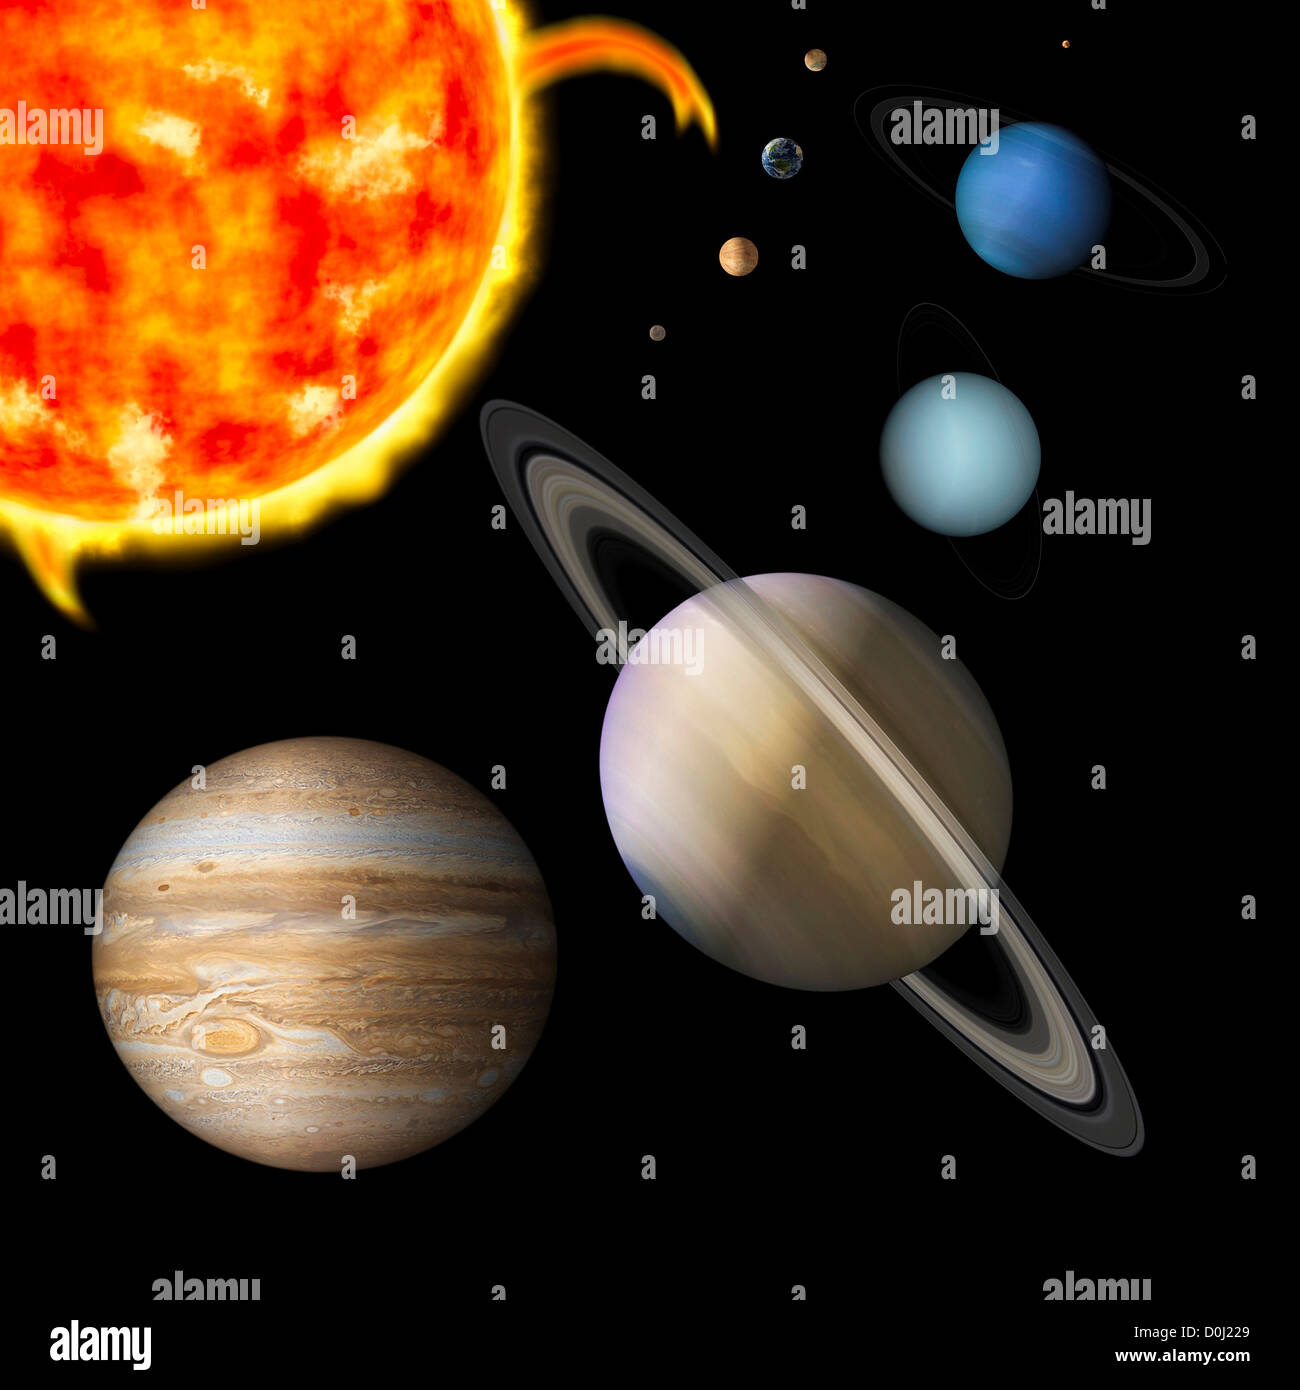 its nine planets and sun - photo #3